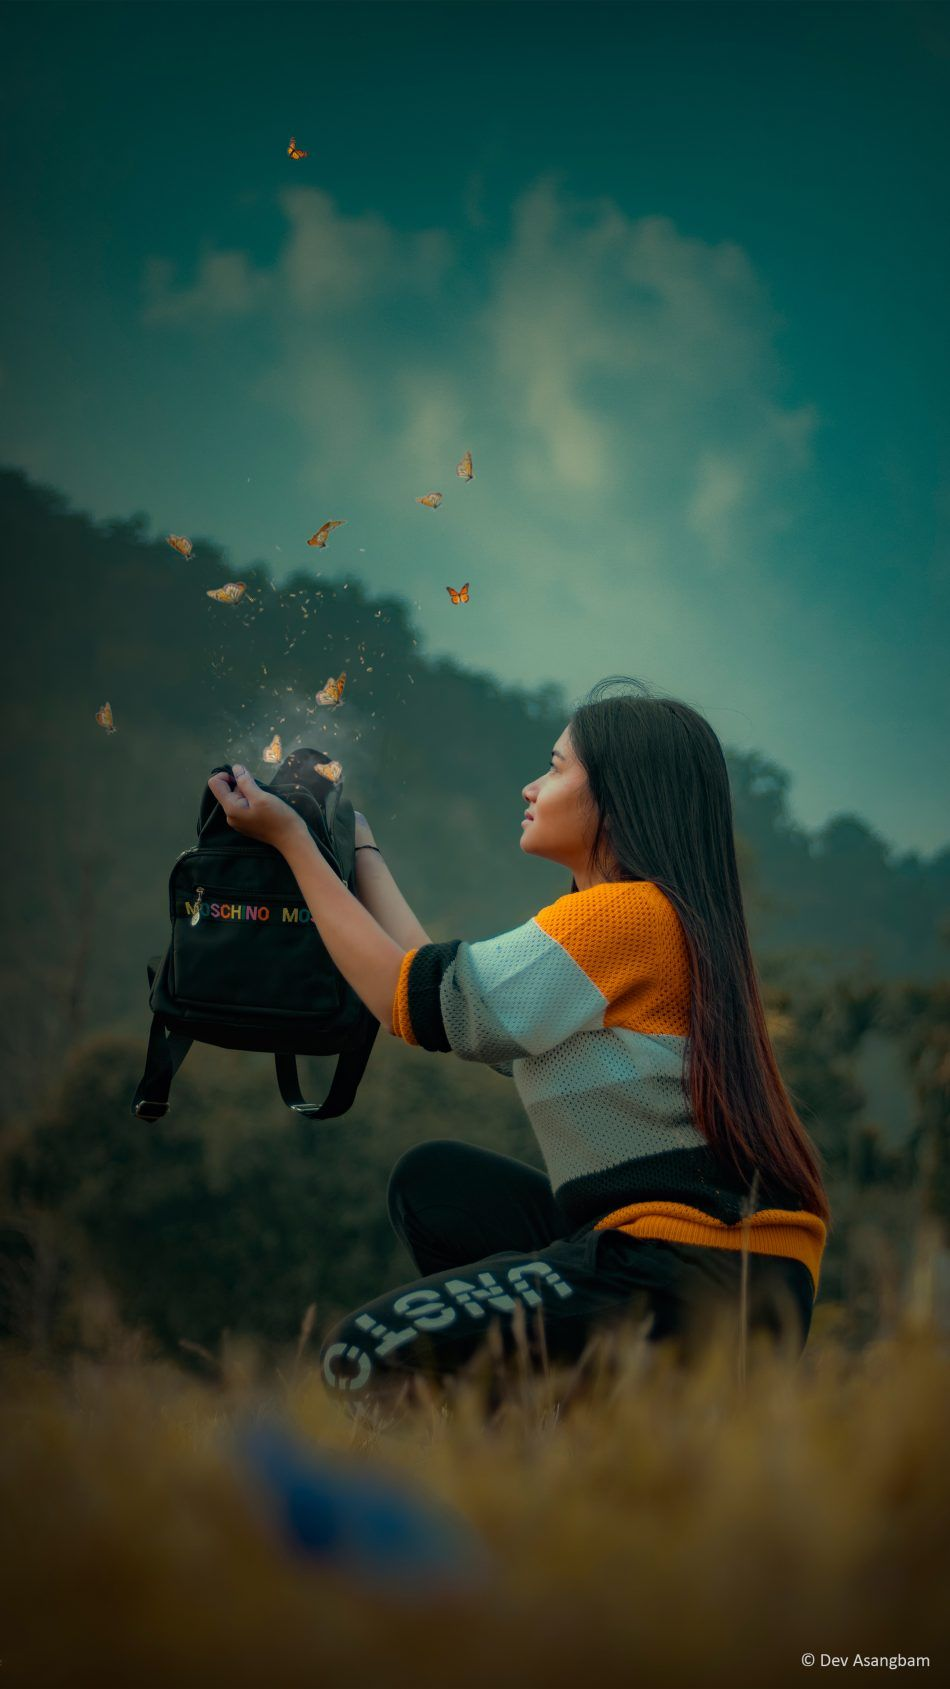 Girl Fantasy Butterflies P Ography 4k Ultra Hd Mobile Wallpaper